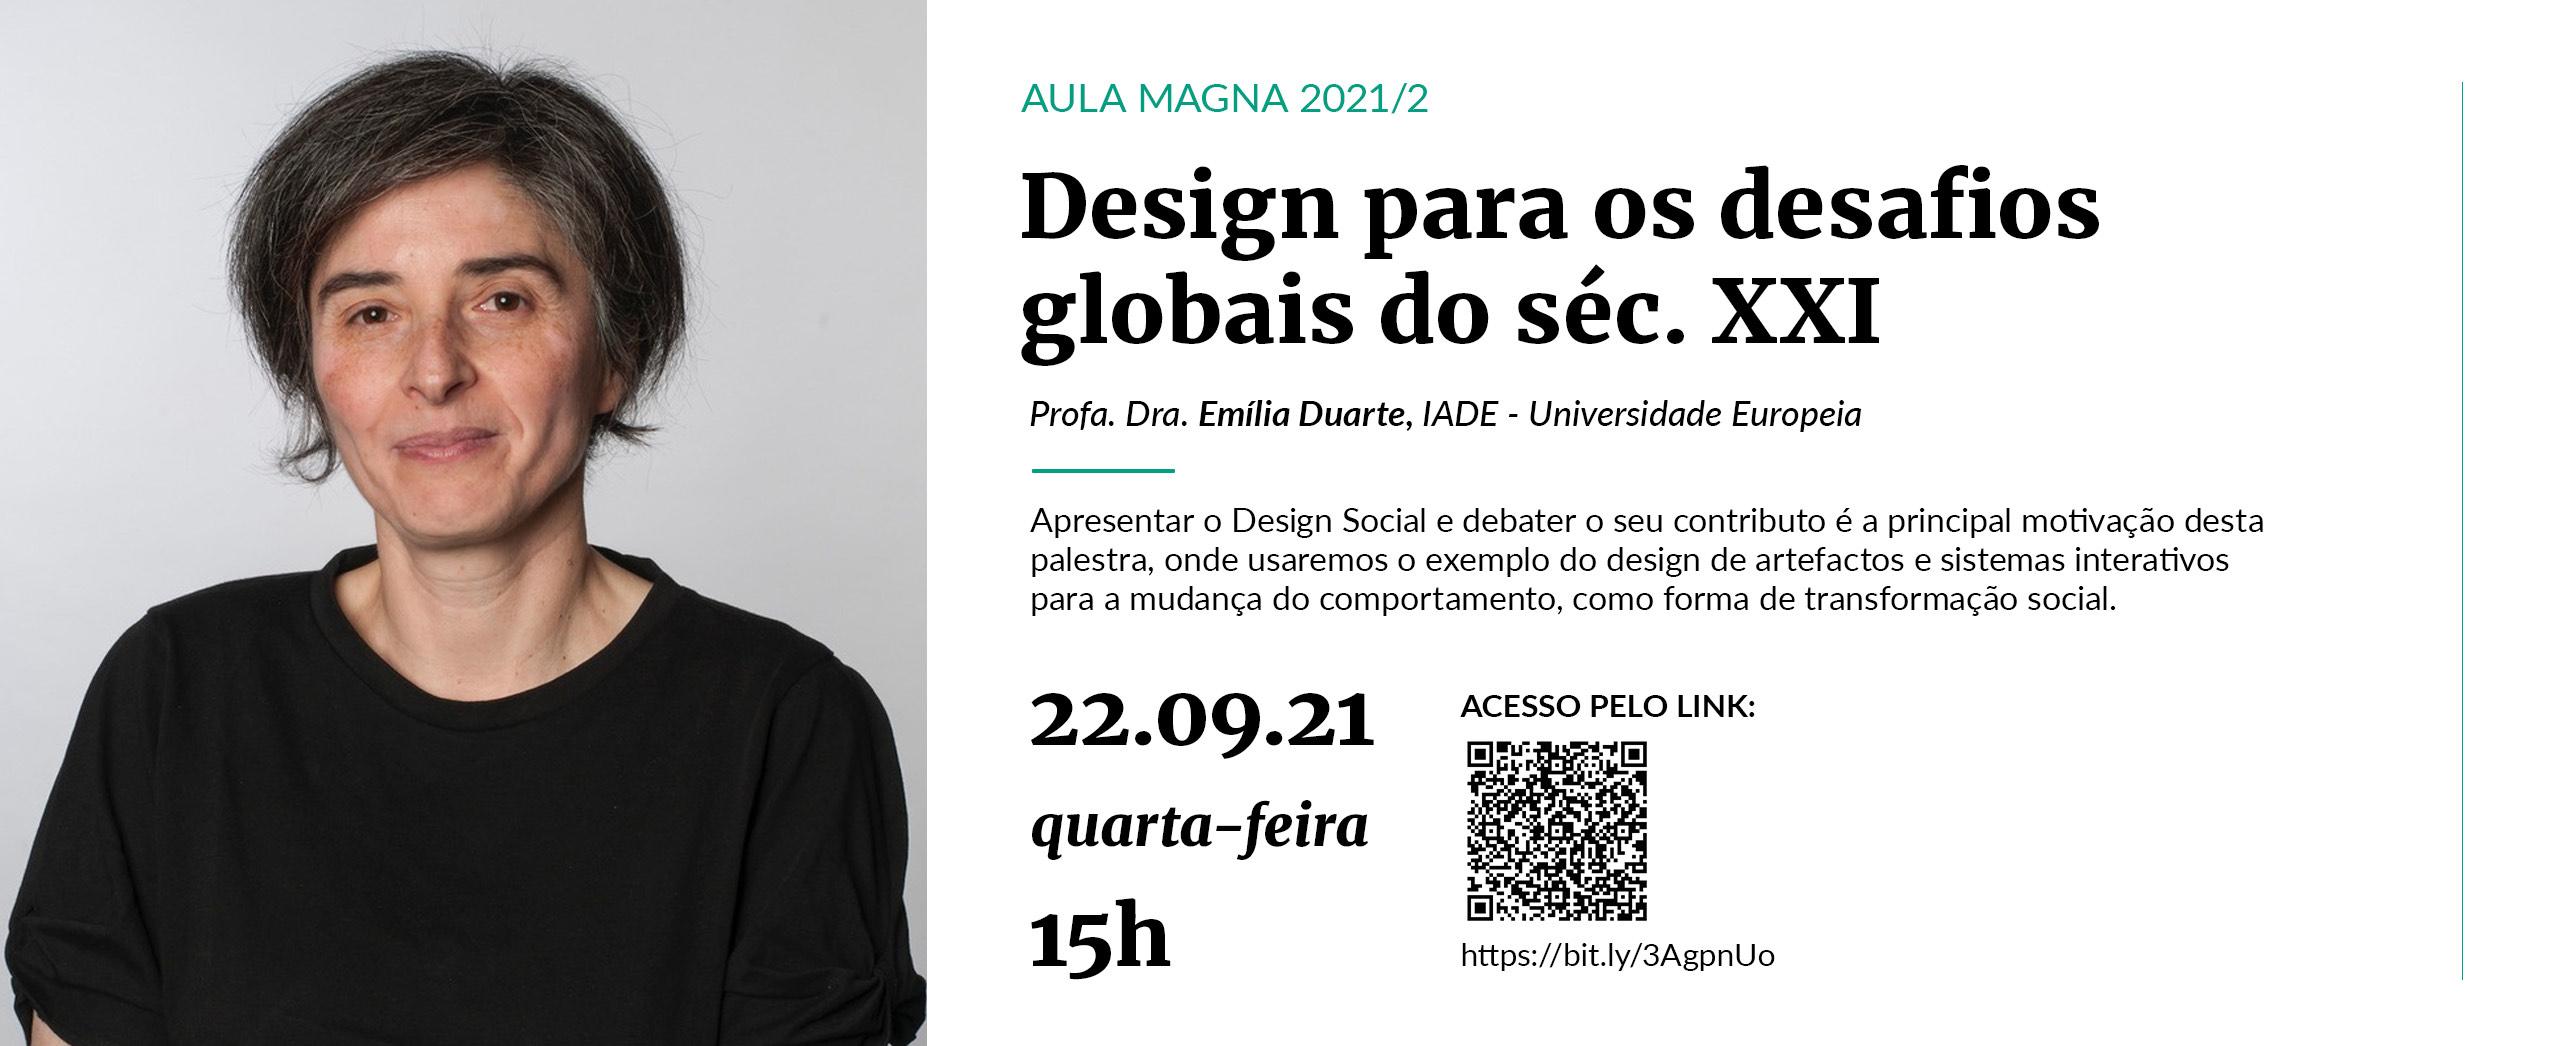 Design para os desafios globais do séc. XXI